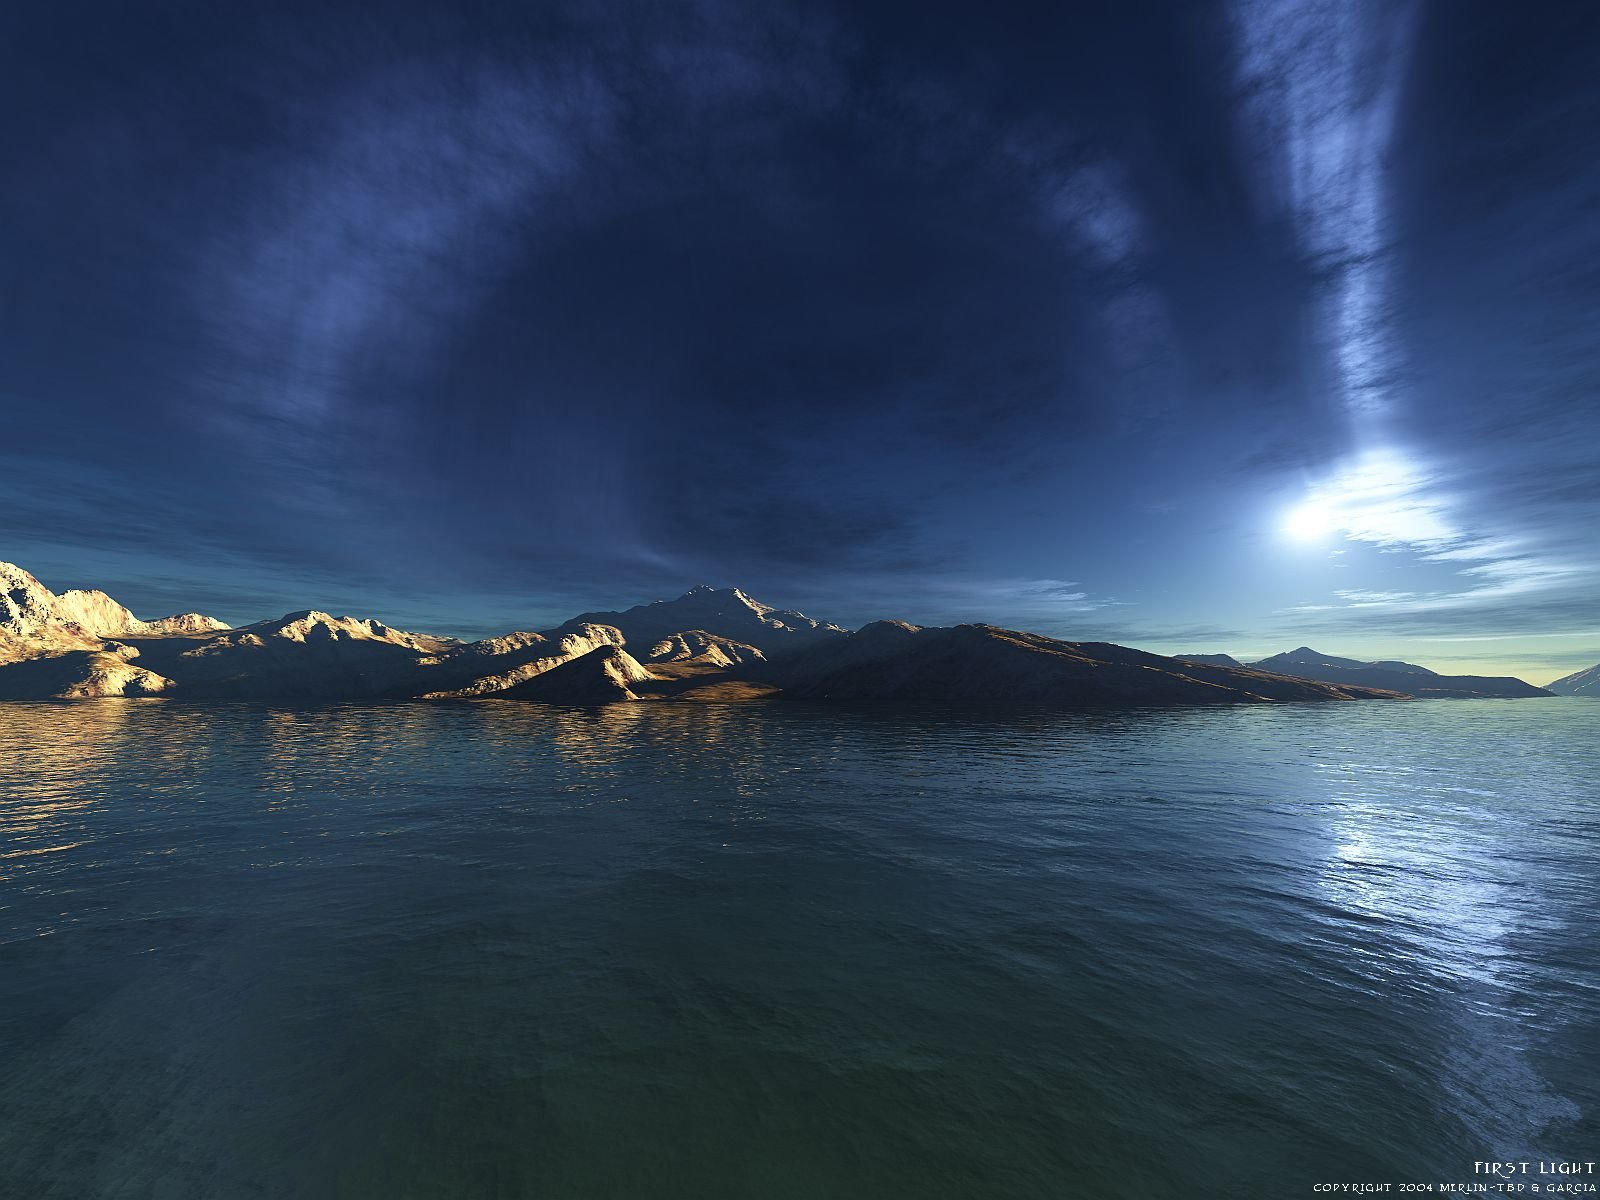 First Light by merlin-tbd